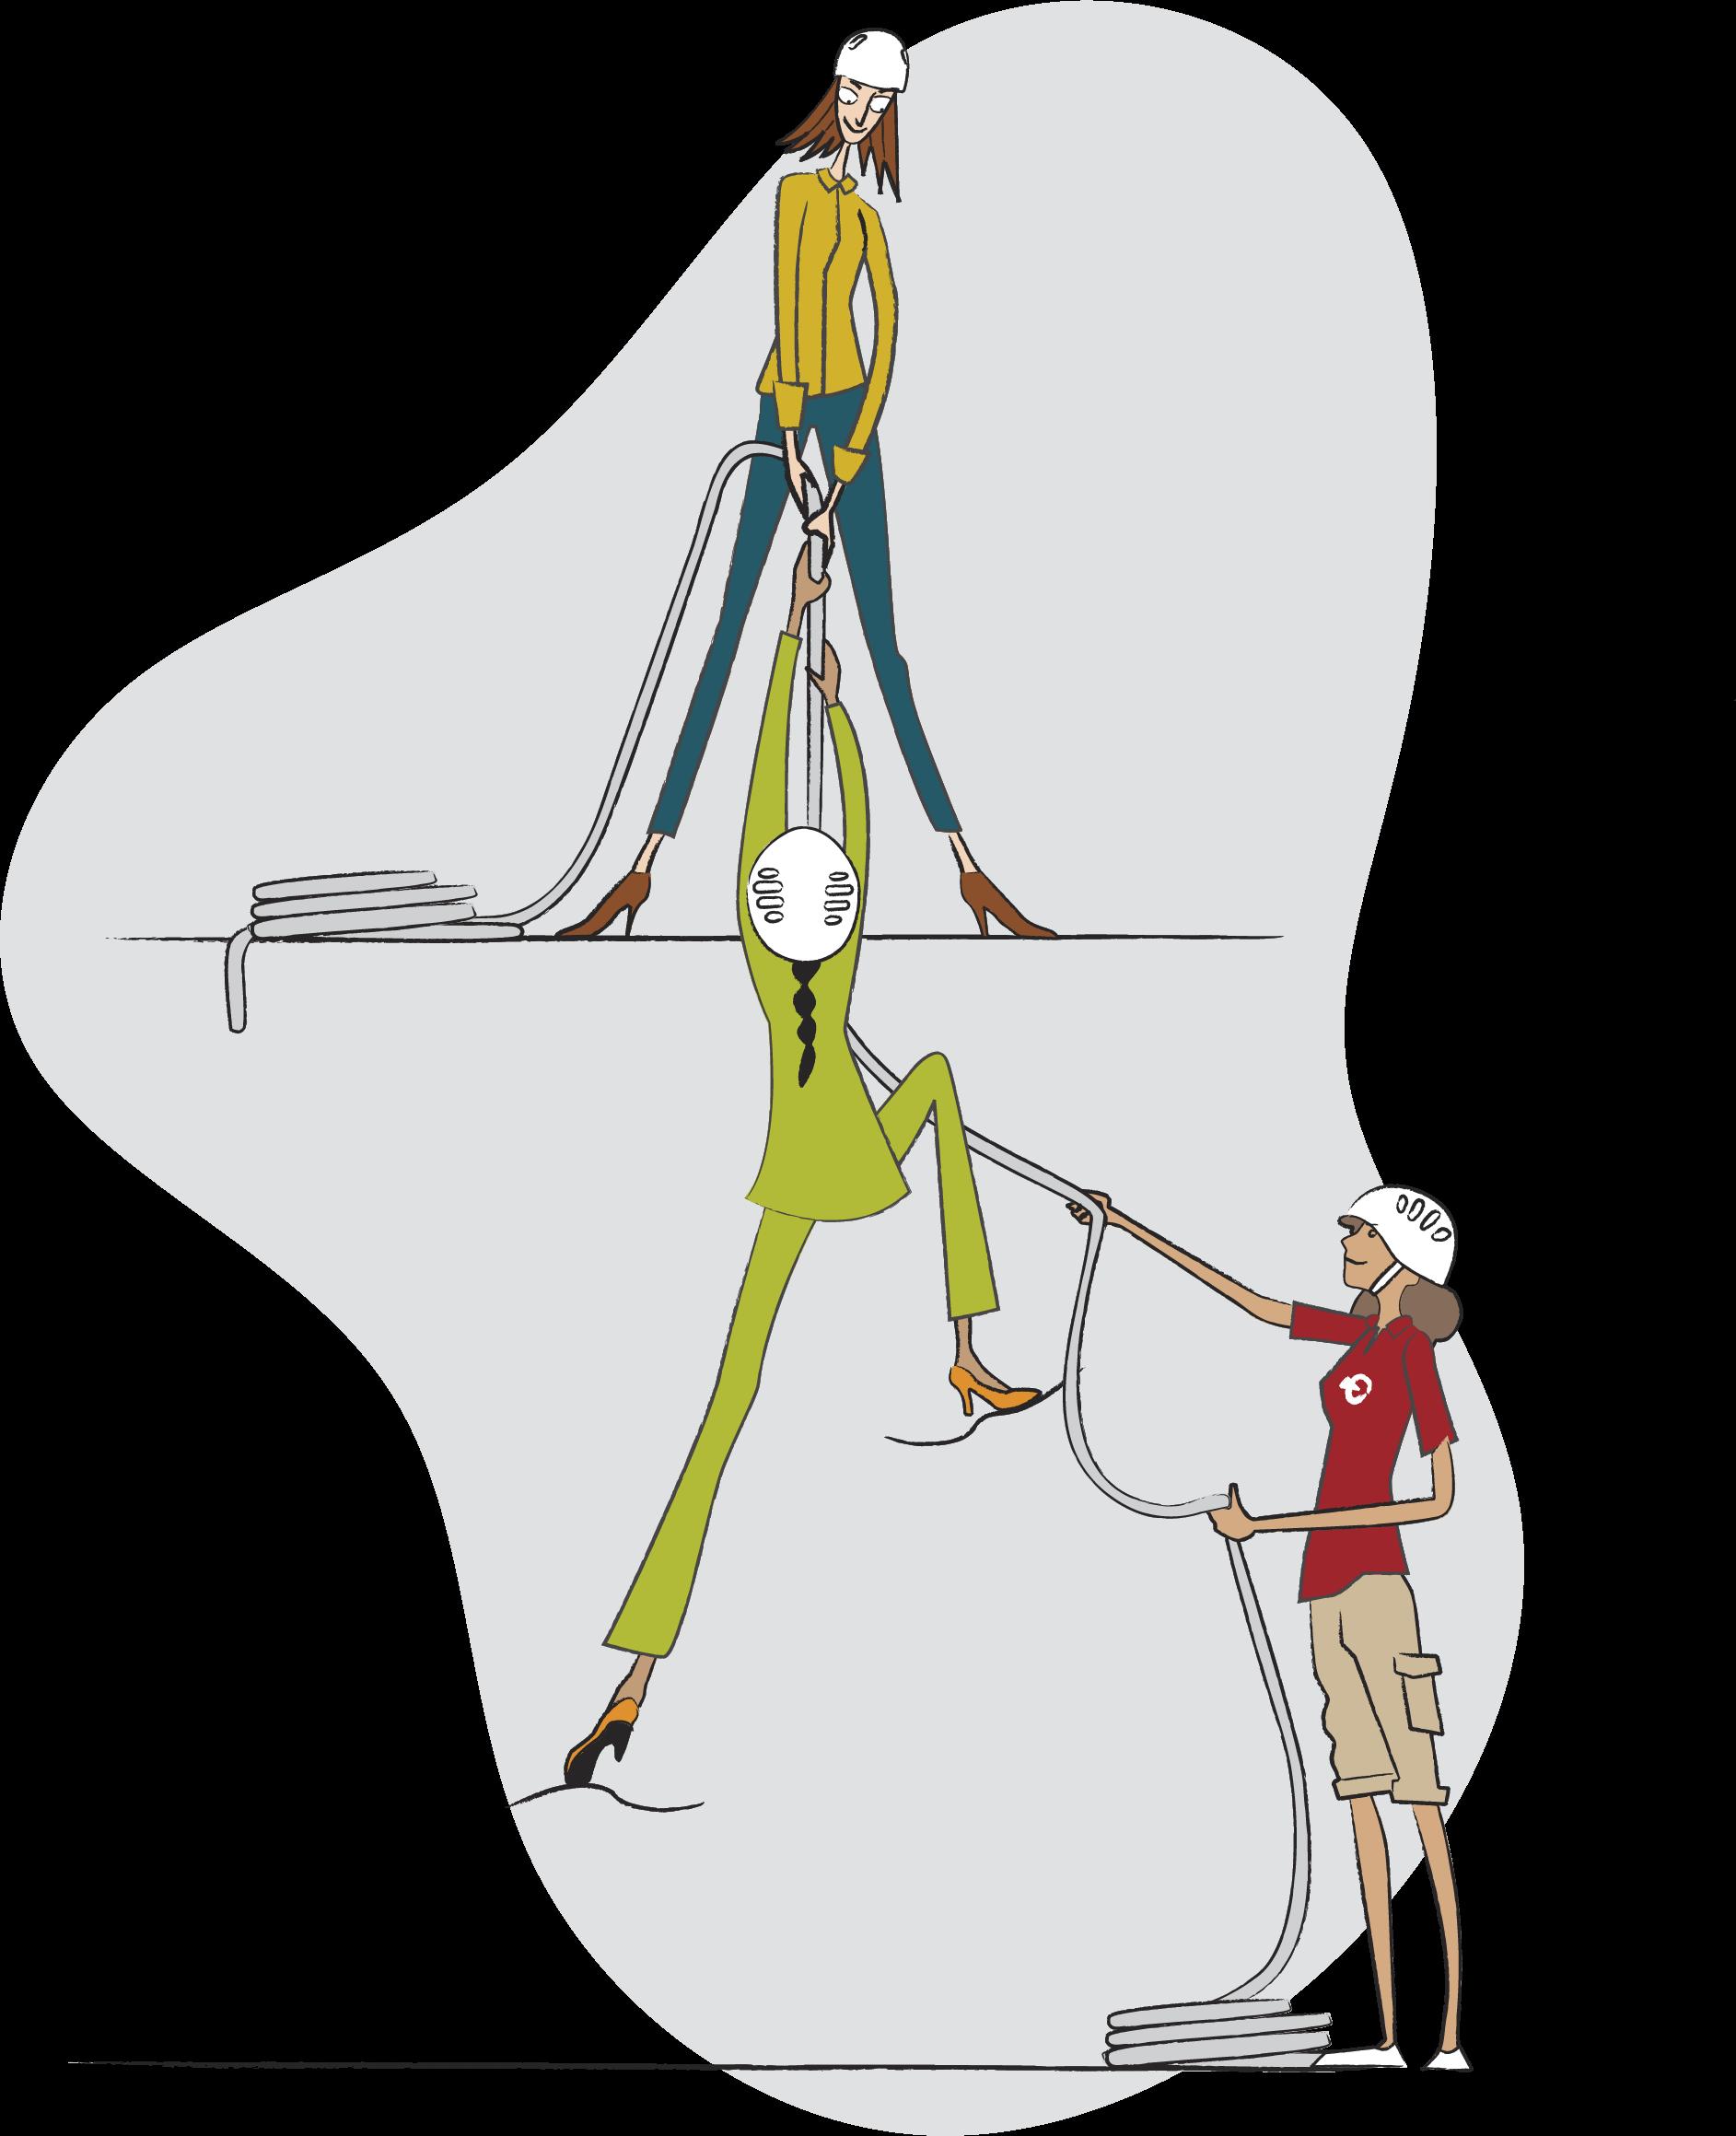 Elevating - we help you grow